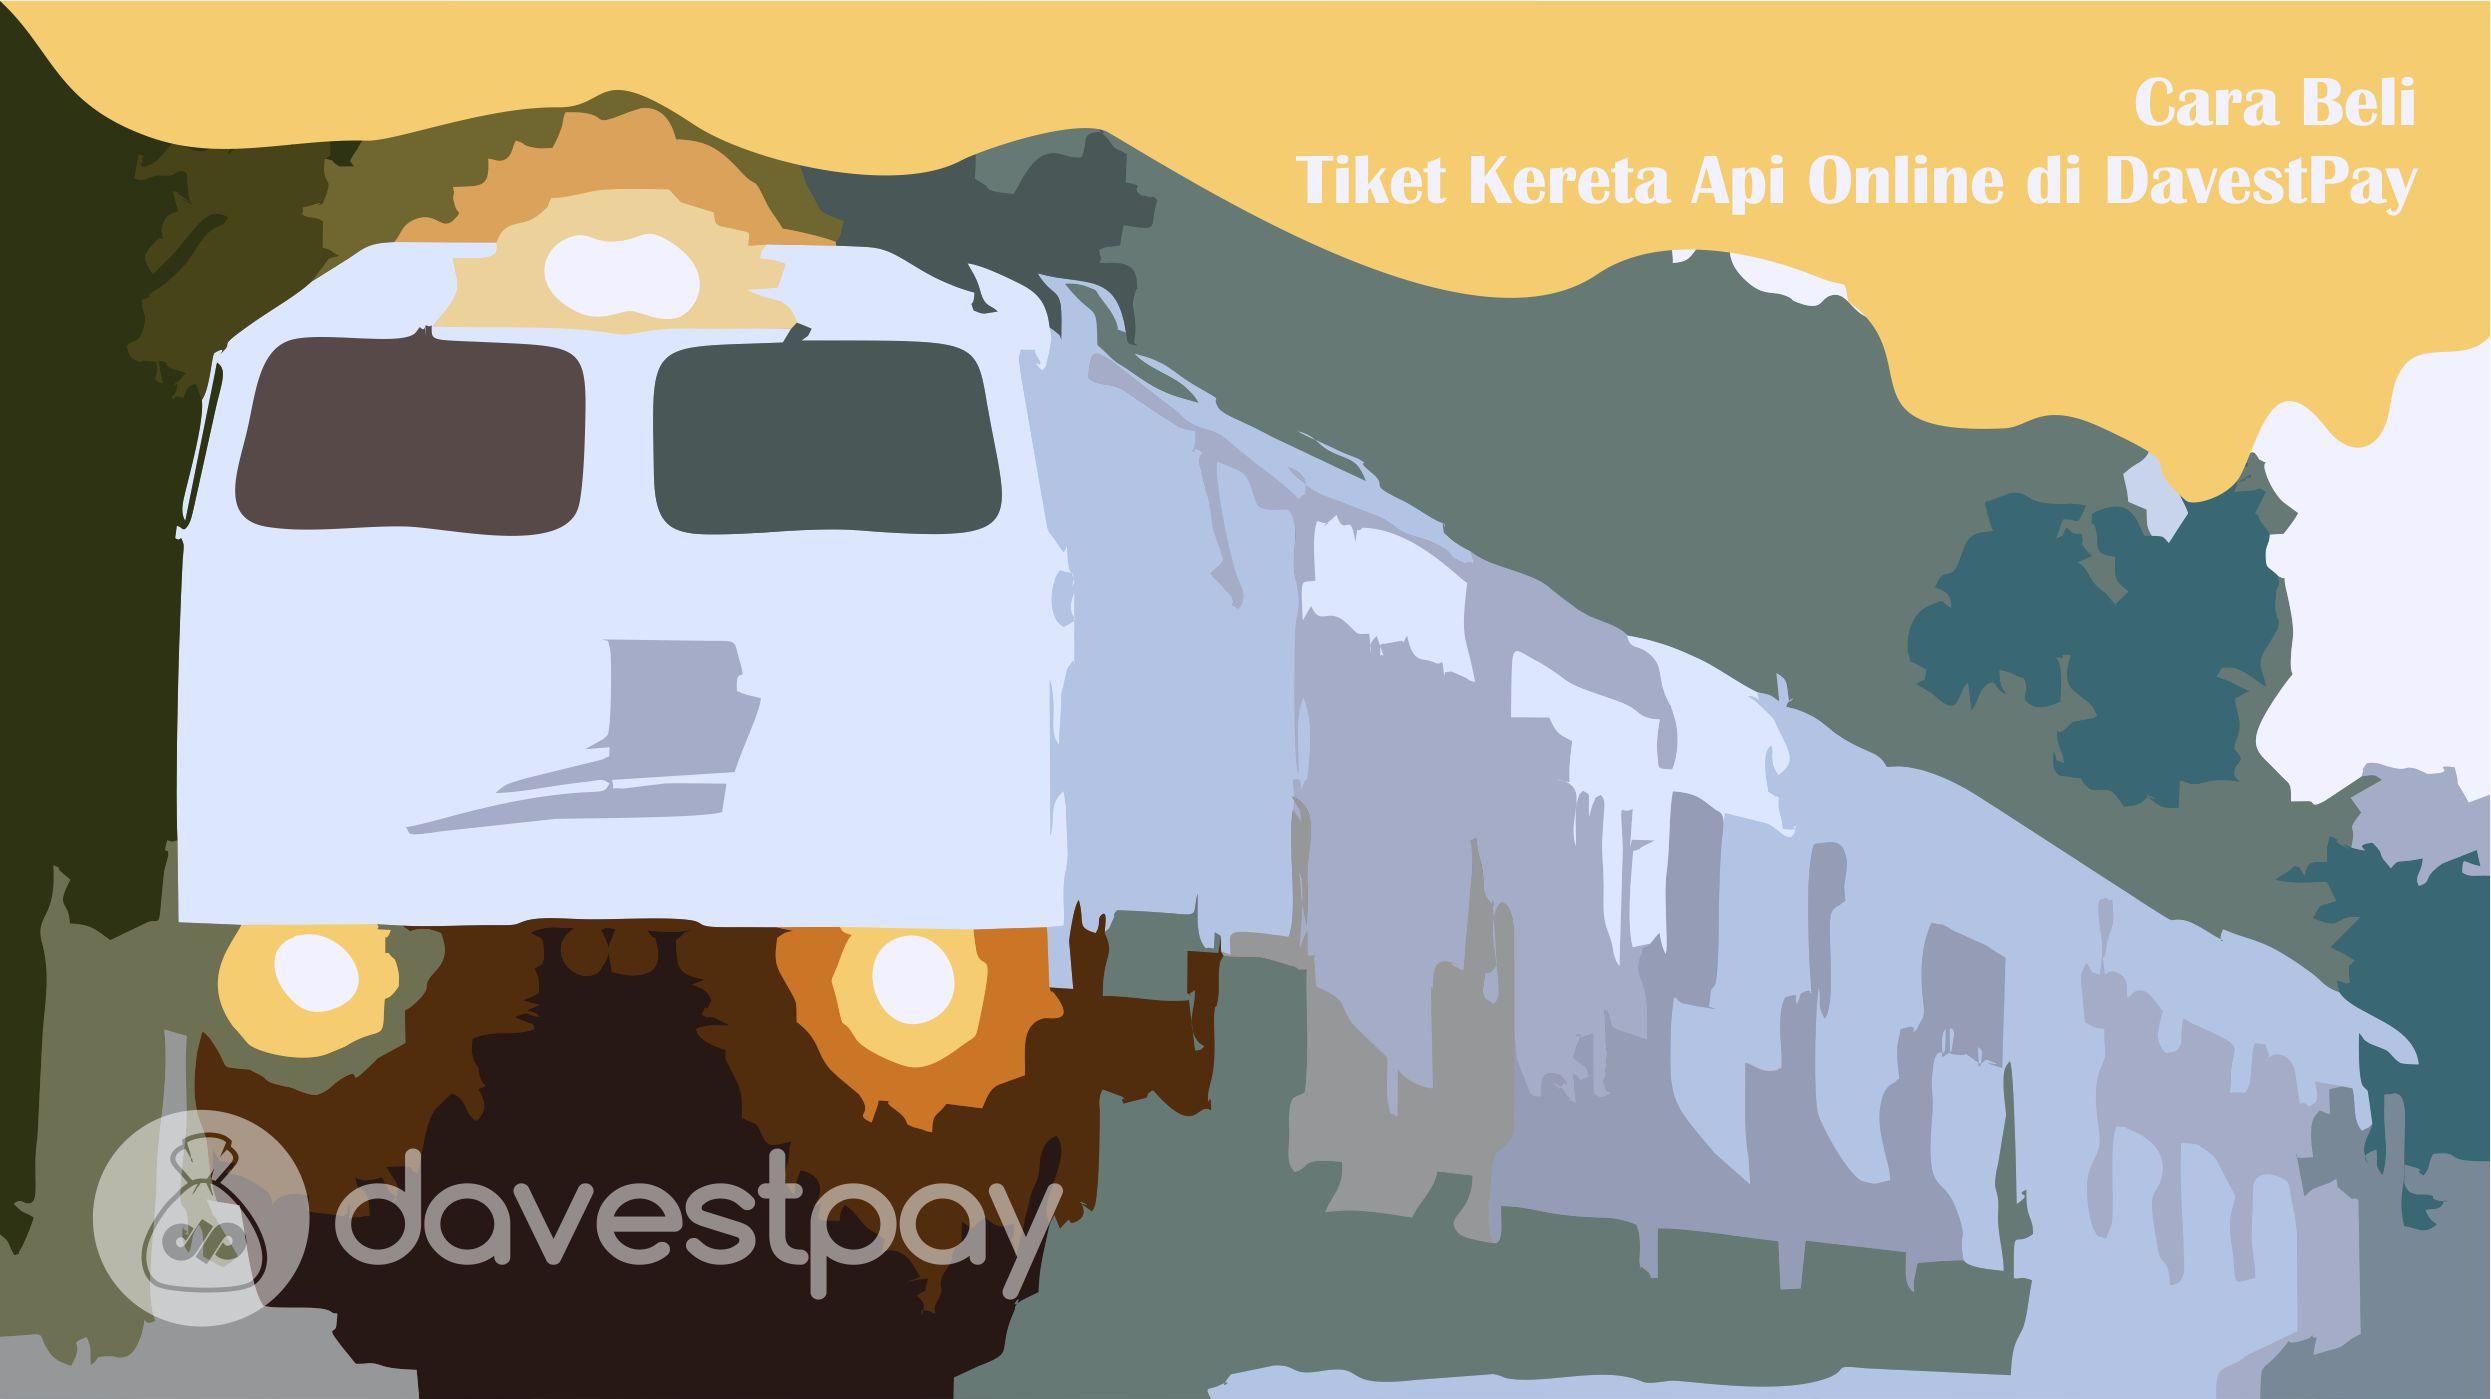 Yuk Ketahui Cara Beli Tiket Kereta Api Online di DavestPay !